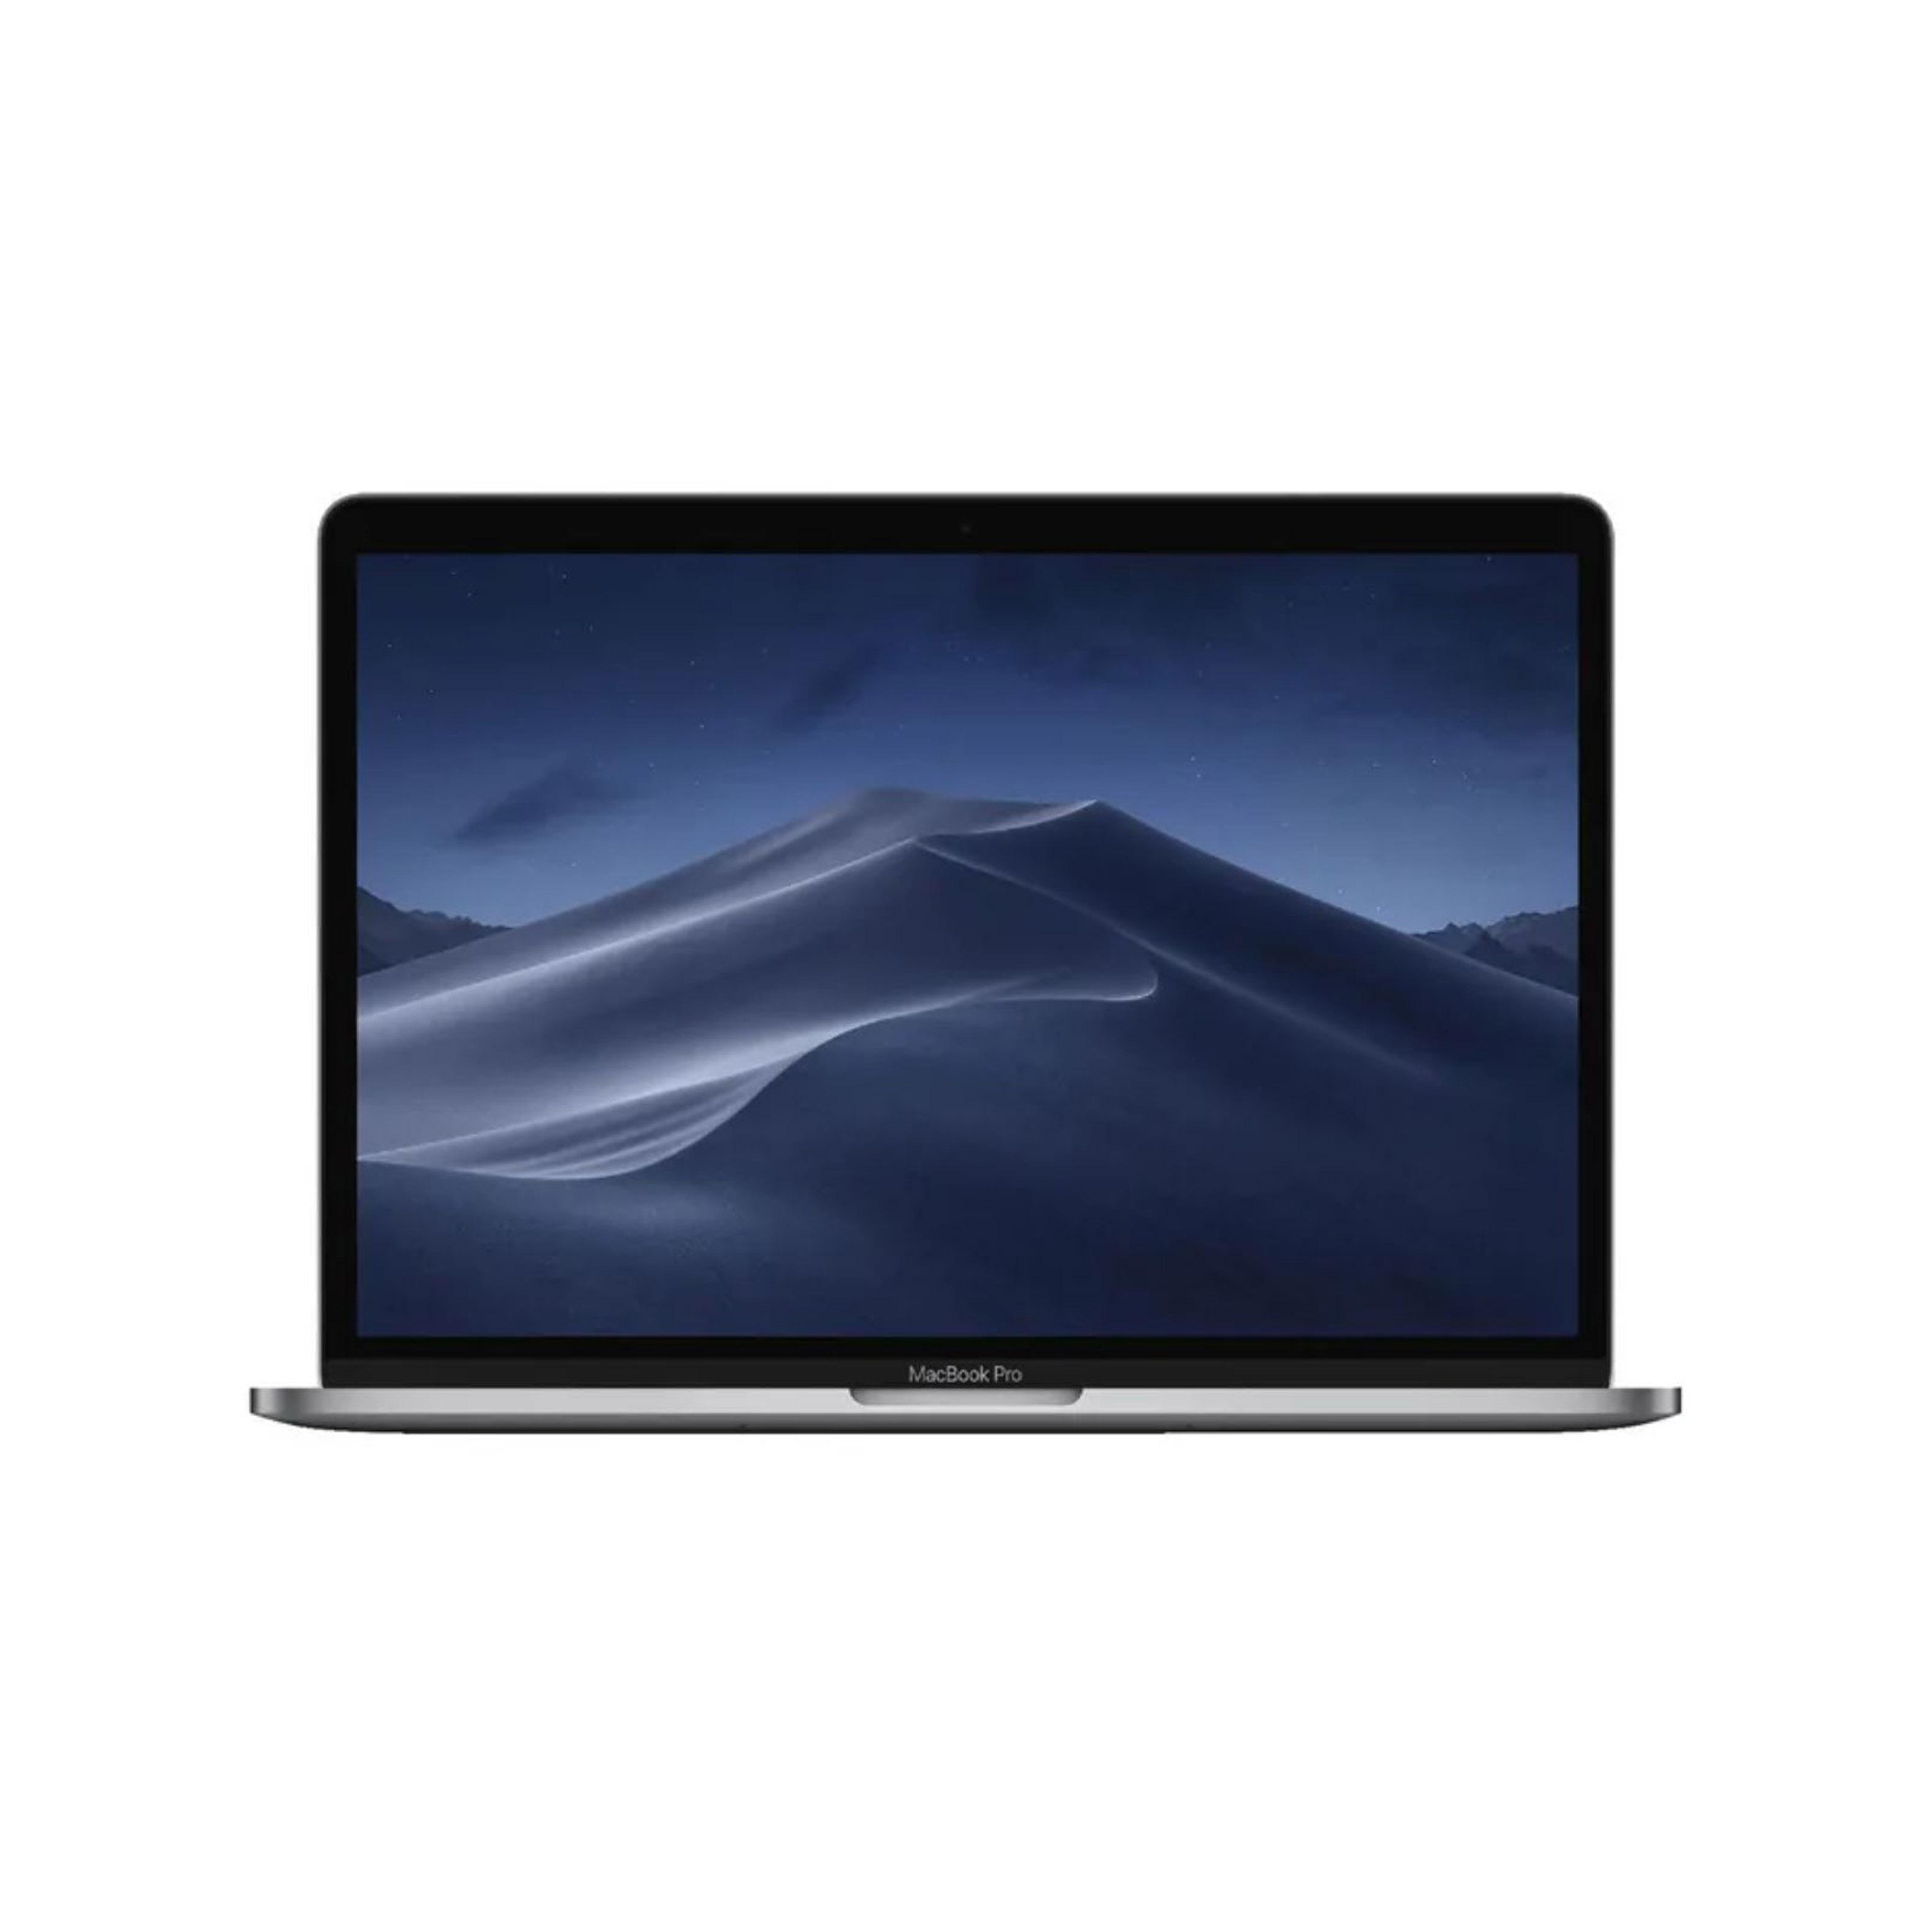 Apple 13in MacBook Pro - 1.4GHz 8th Gen Intel i5 512GB - Space Grey (MXK52X/A)